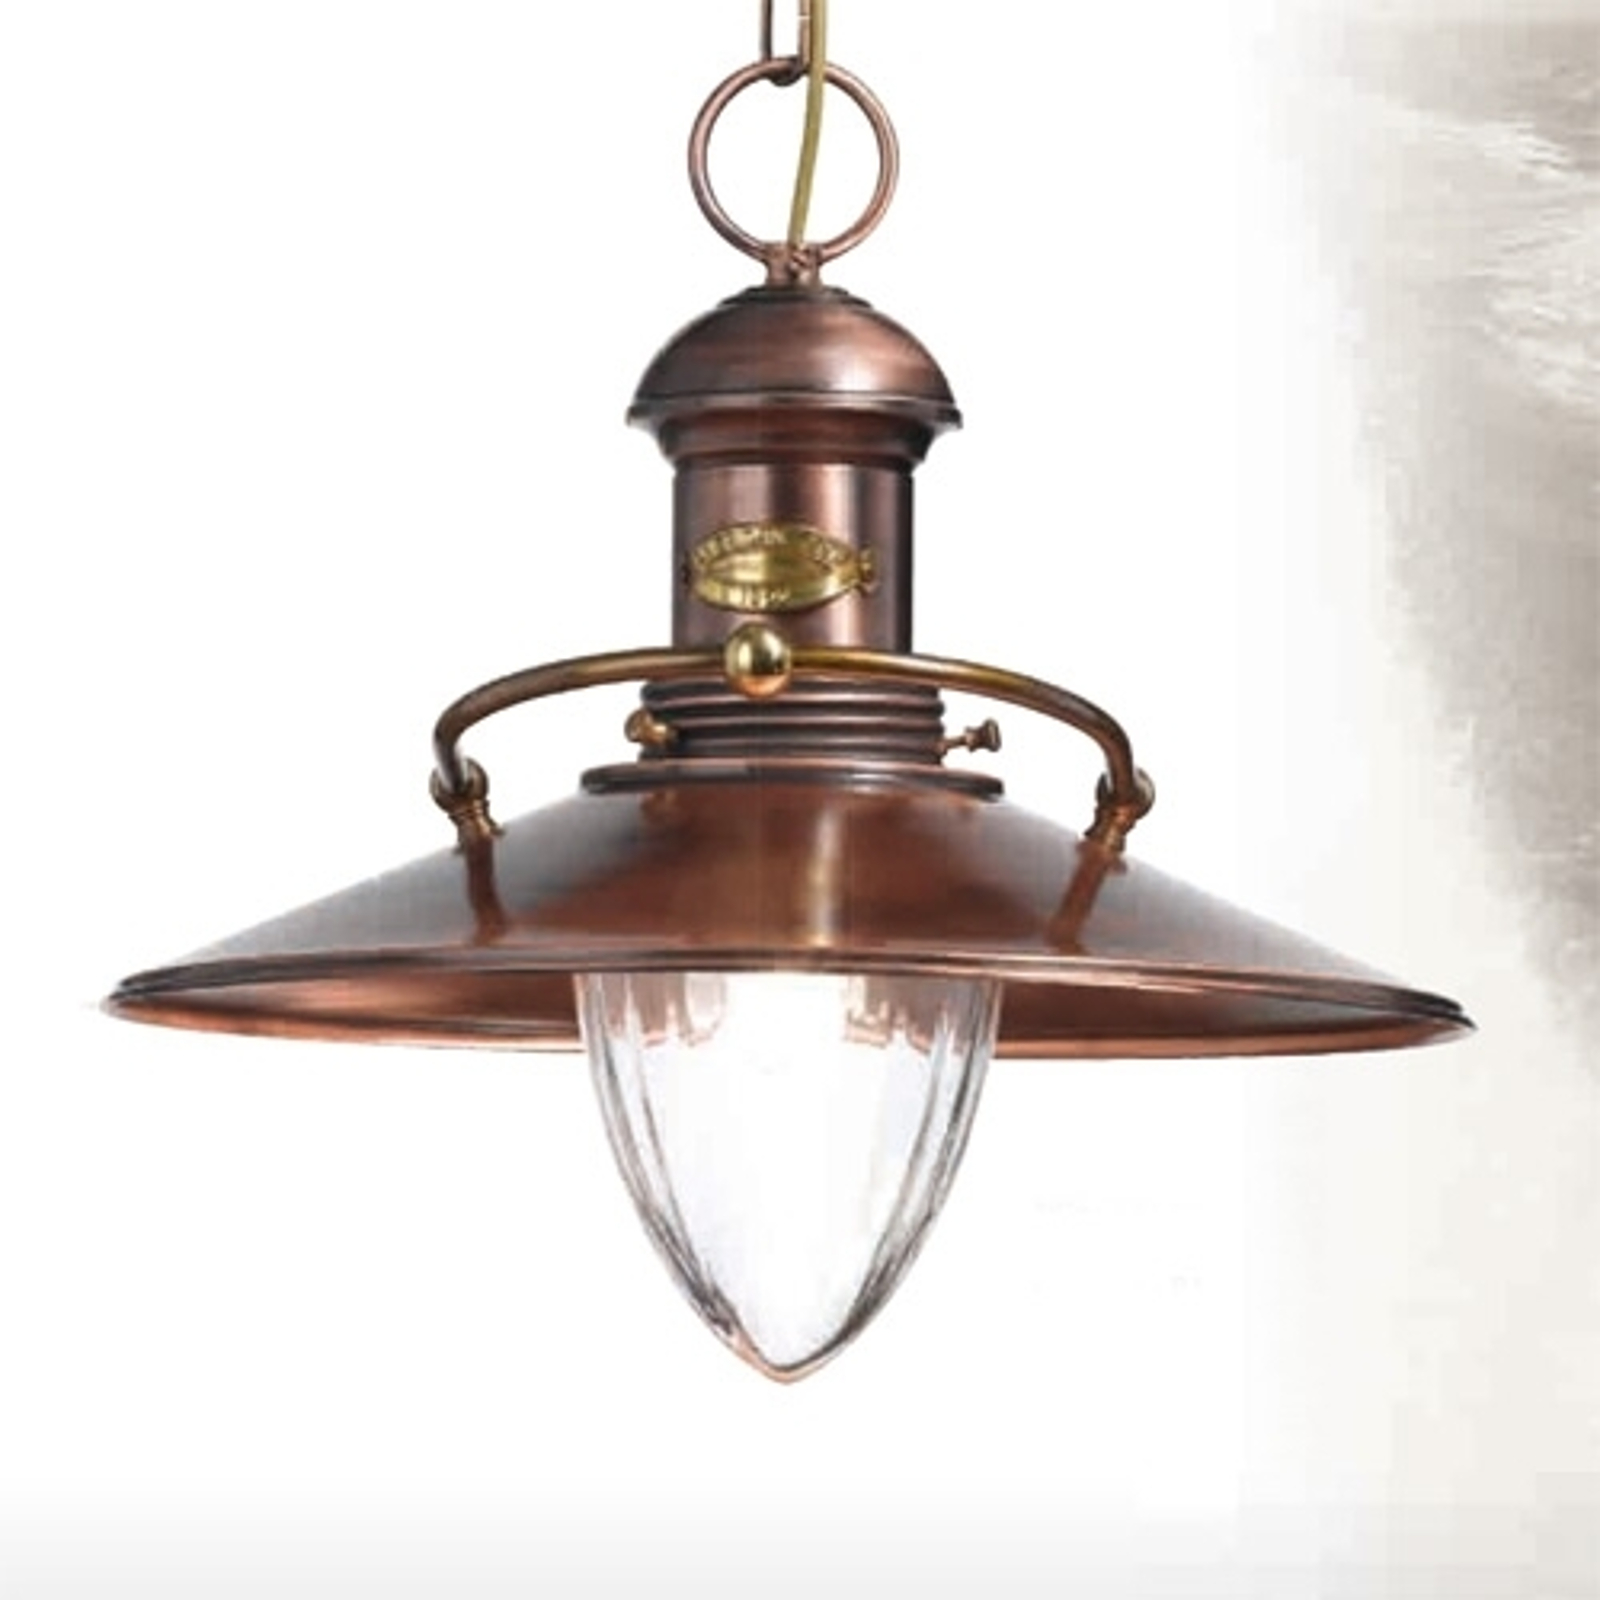 Antieke hanglamp Scia antiek koper